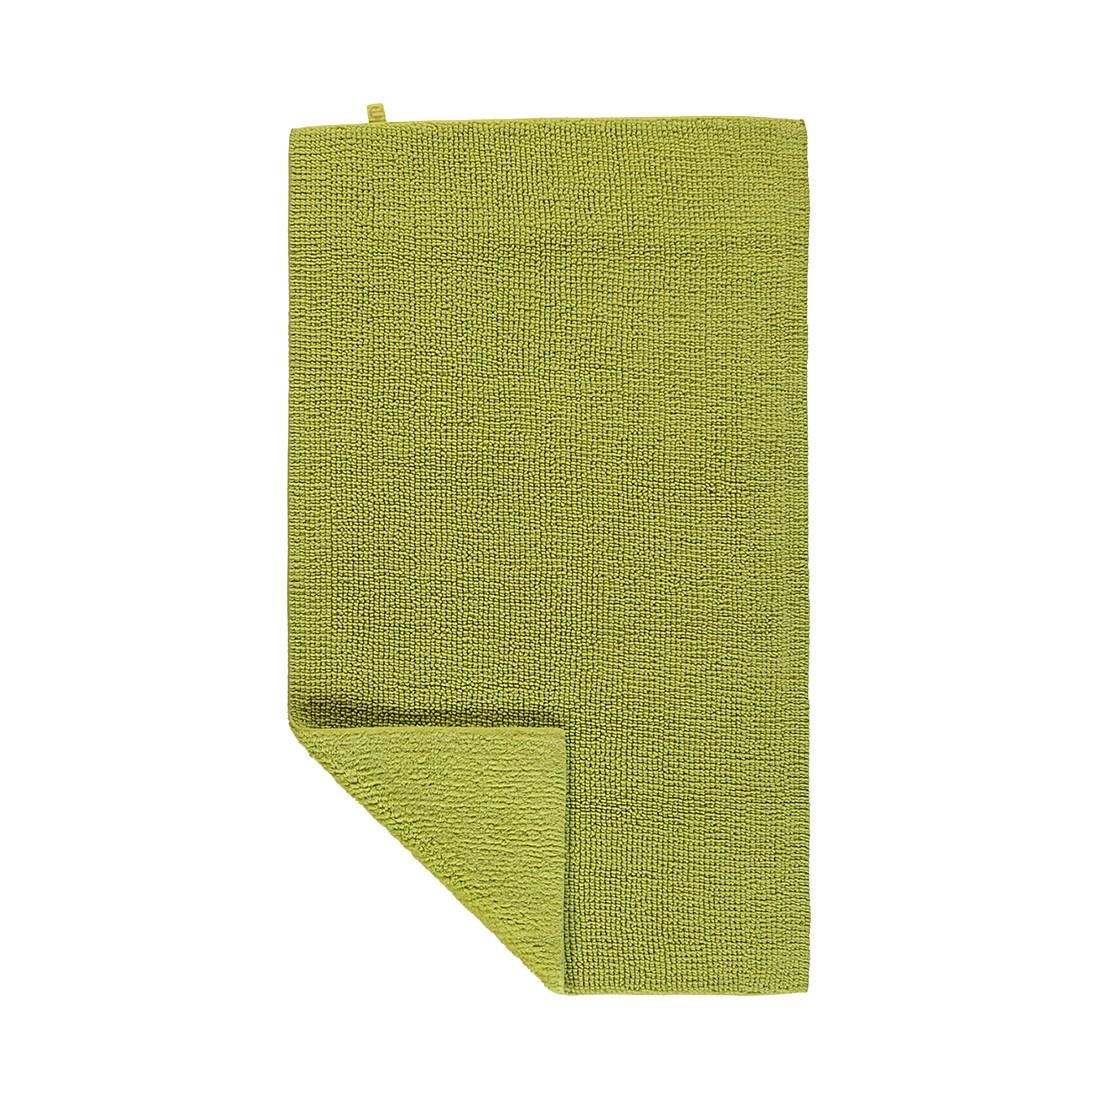 Badteppiche Pur - 100% Baumwolle limette - 208 - 70 x 130 cm, Rhomtuft